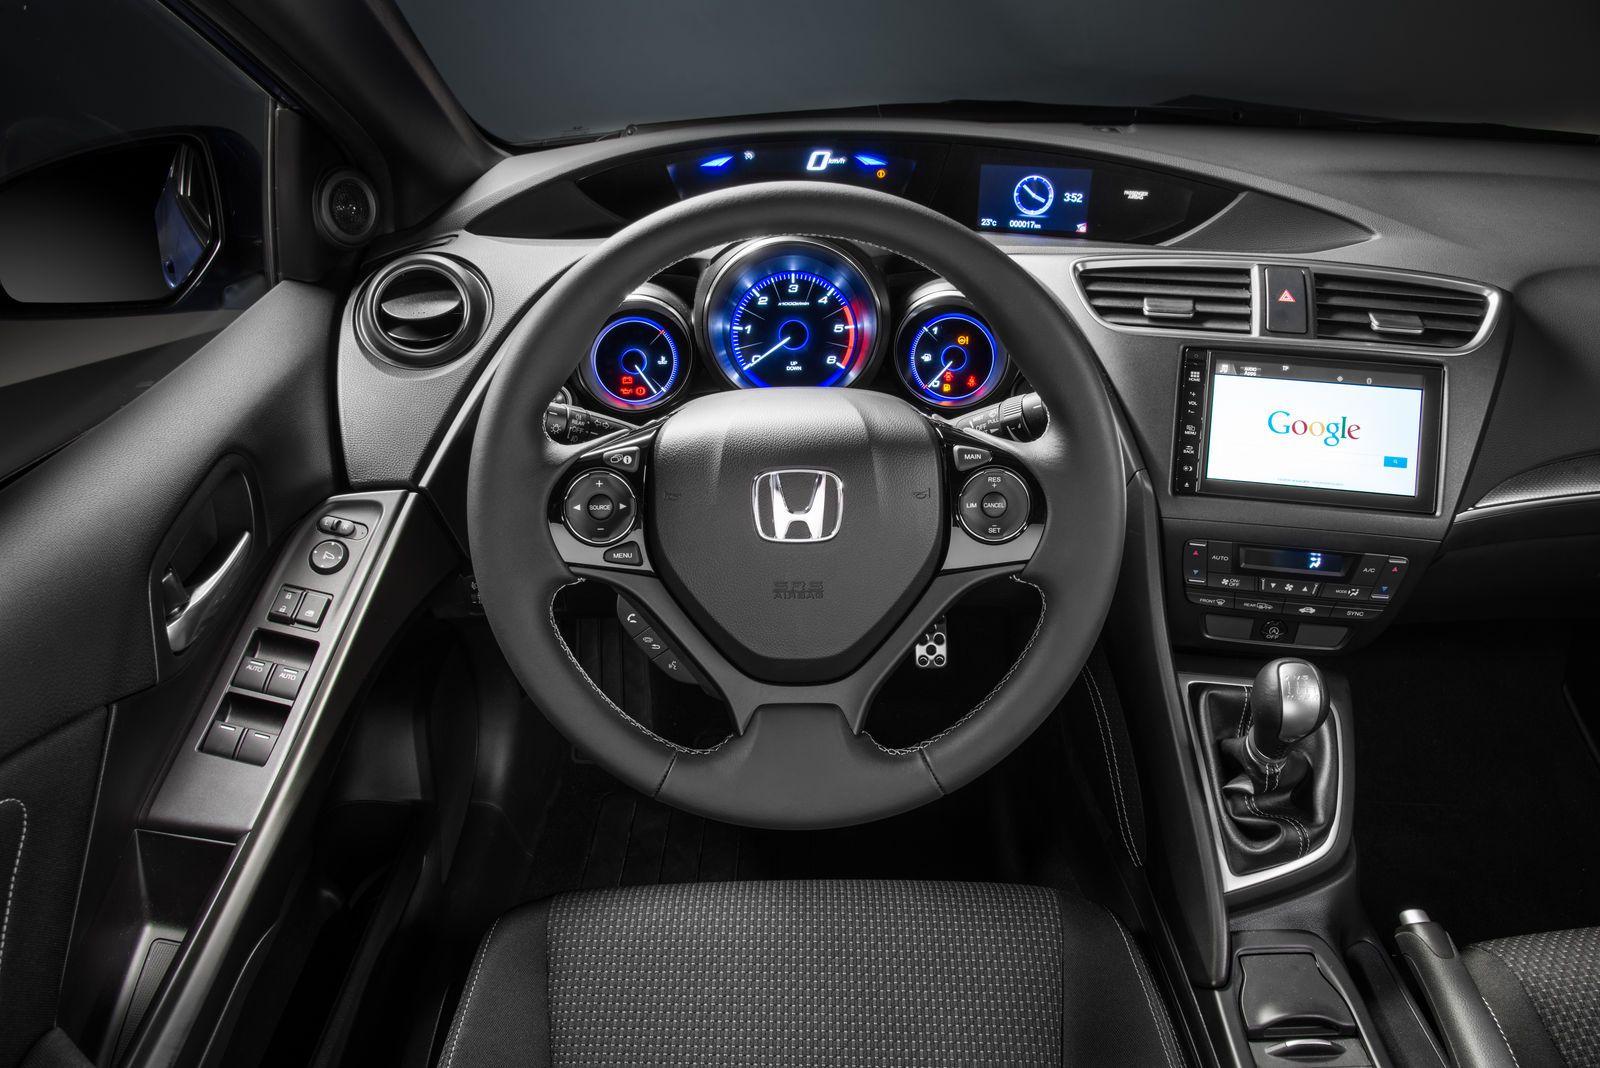 Genial 7th Gen Civic Es1 Es2 Civic Honda Jdm Em2 Wide Body Civic | Civic 90s To  00u0027s | Pinterest | Jdm, Honda And Honda Civic